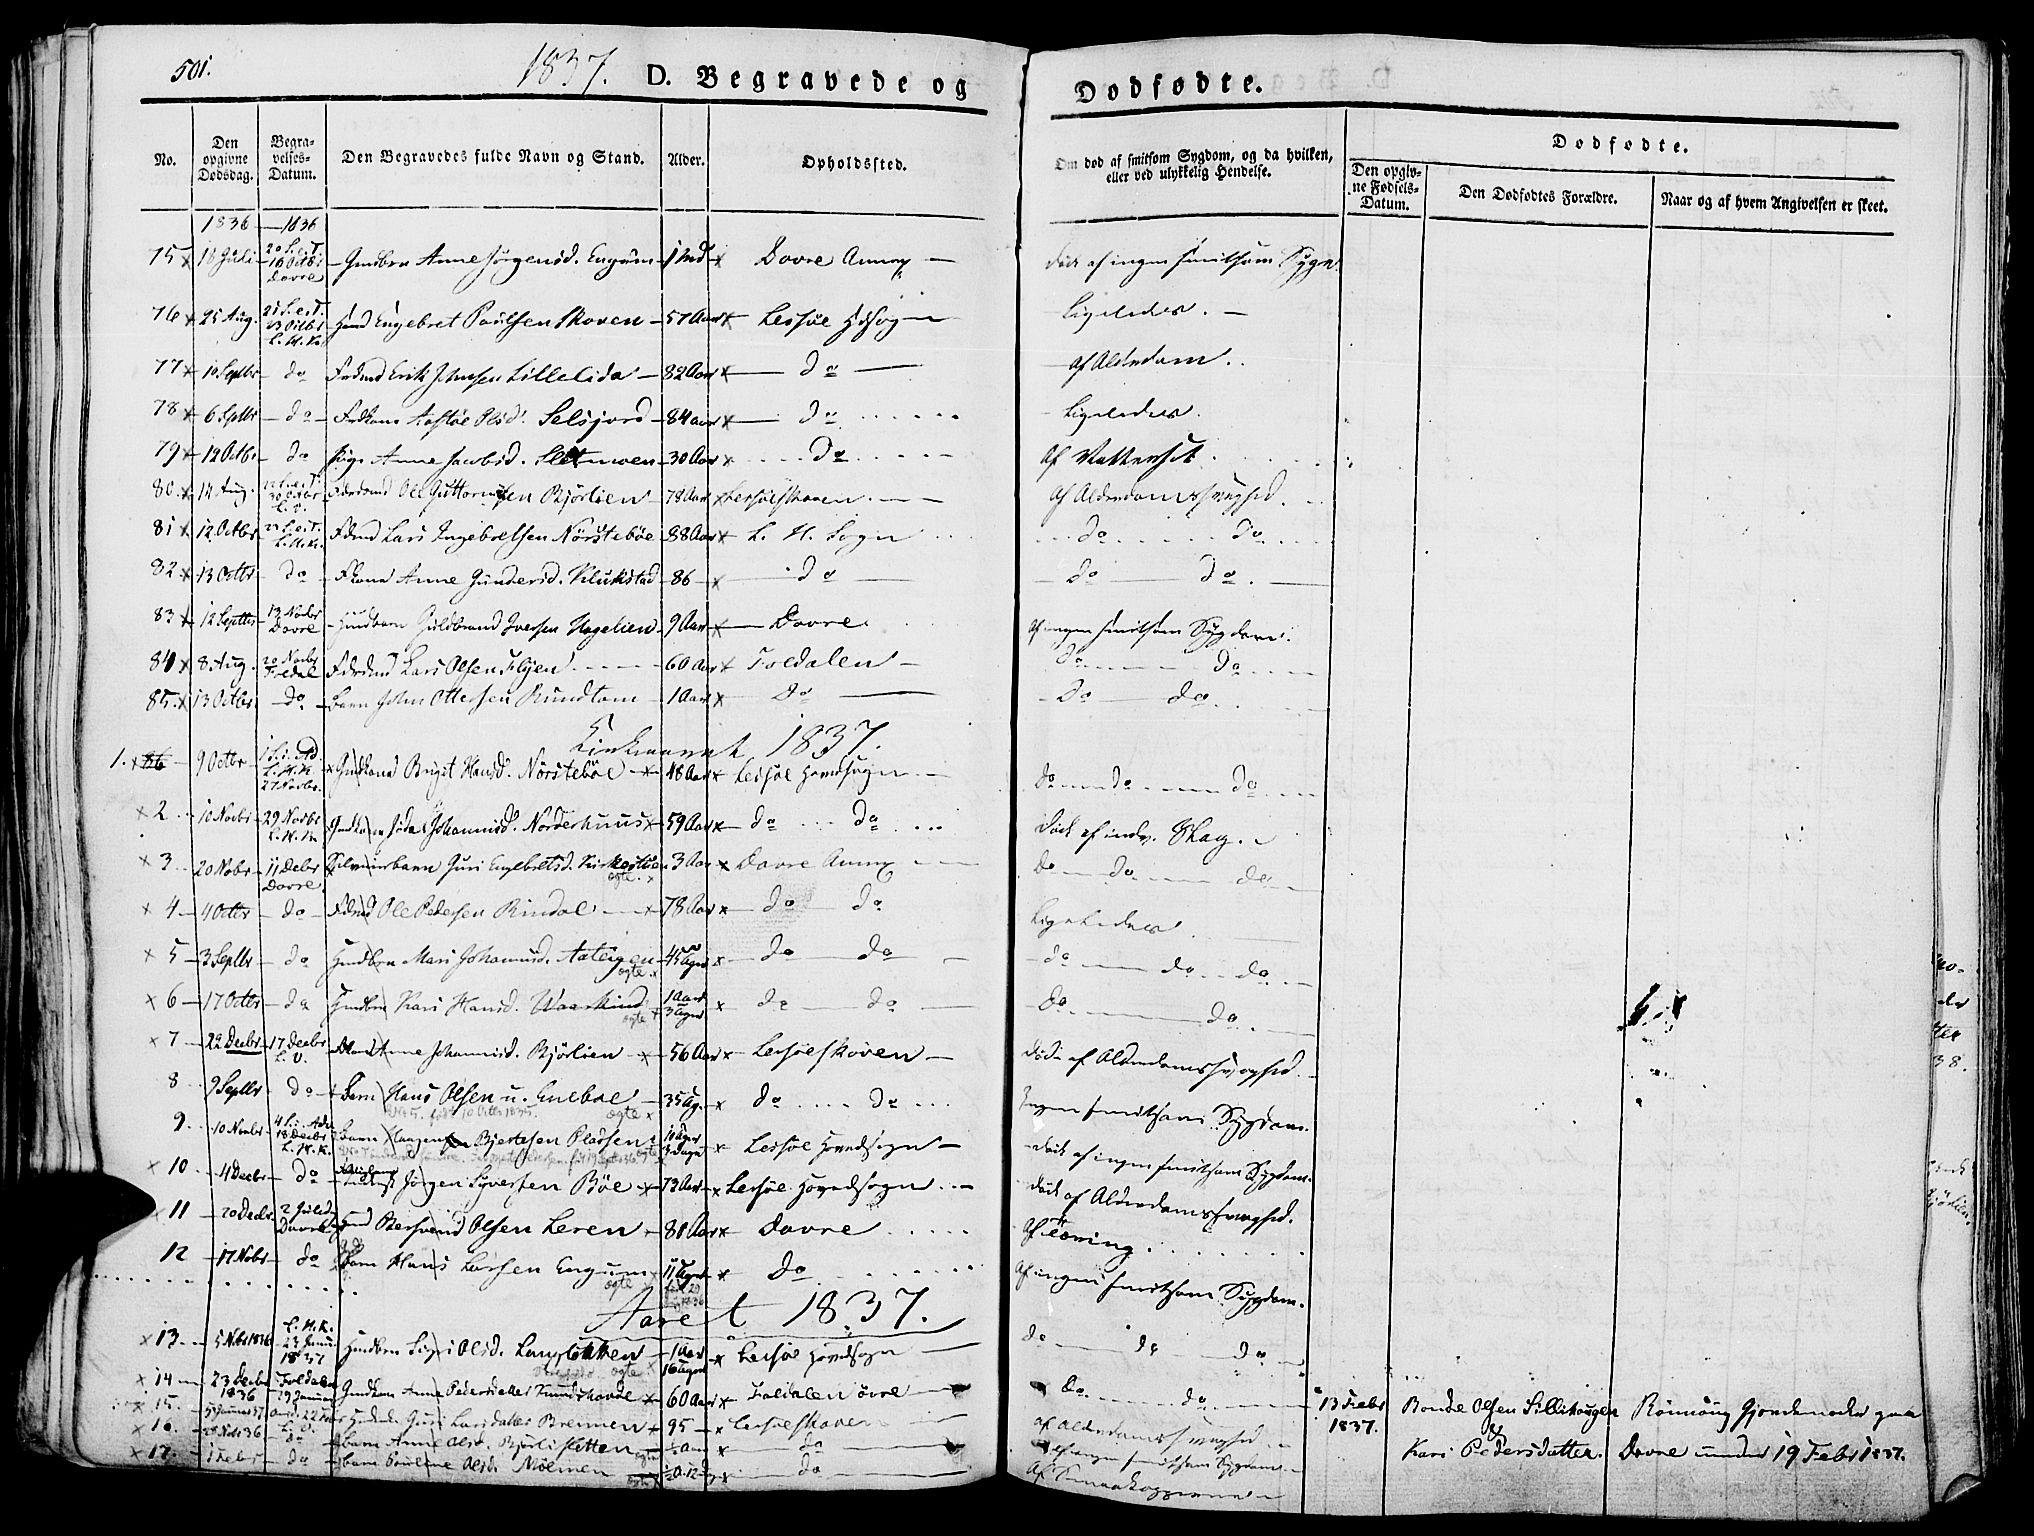 SAH, Lesja prestekontor, Ministerialbok nr. 5, 1830-1842, s. 501